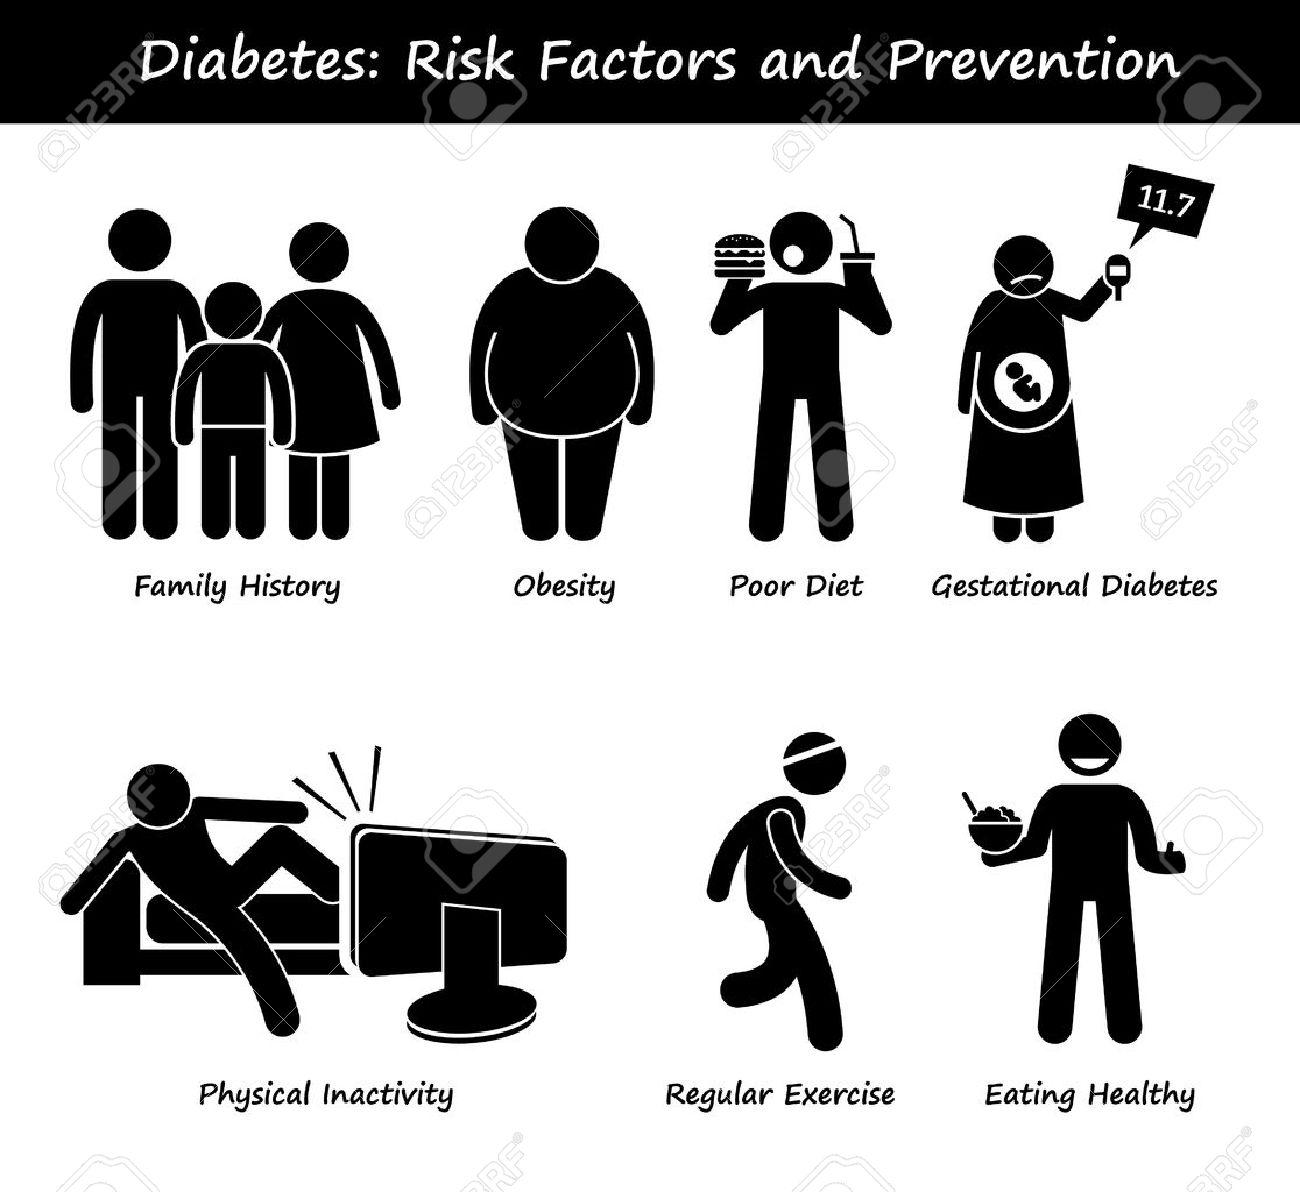 Diabetes Mellitus Diabetic High Blood Sugar Risk Factors and Prevention Stick Figure Pictogram Icons - 47245587